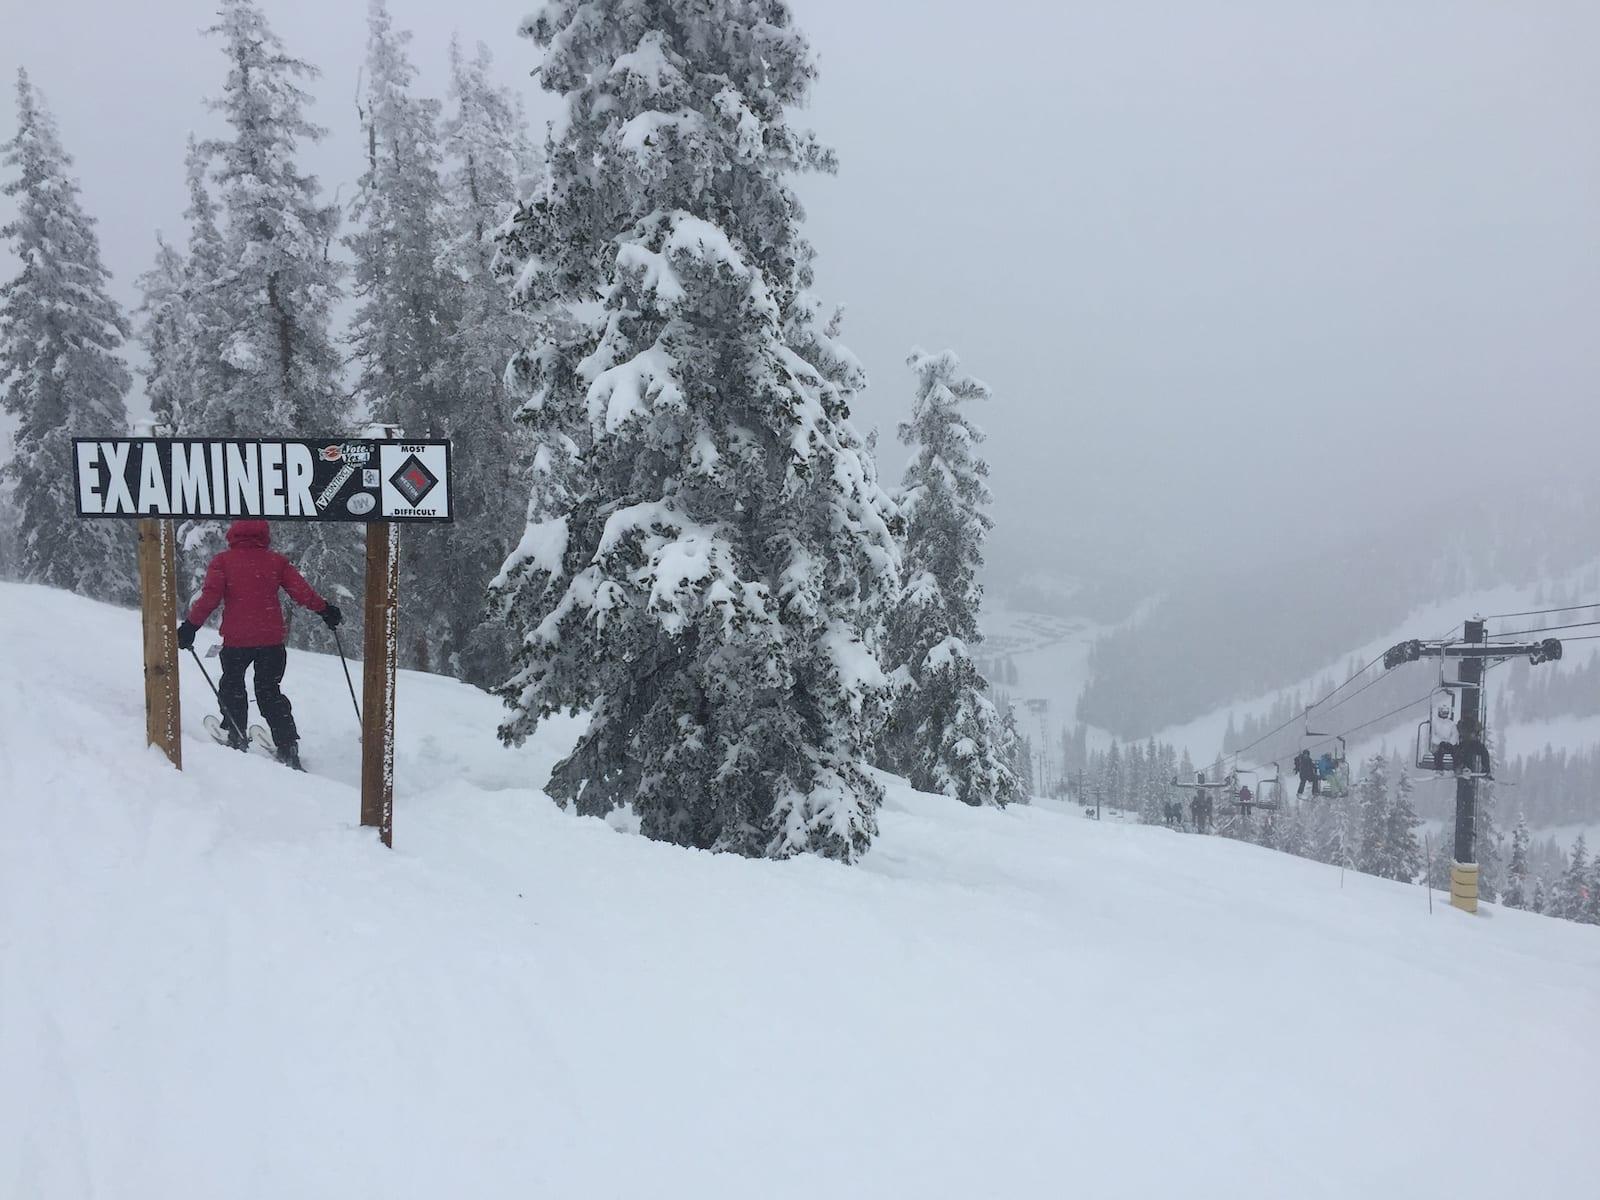 Monarch Mountain Ski Resort Examiner Expert Trail